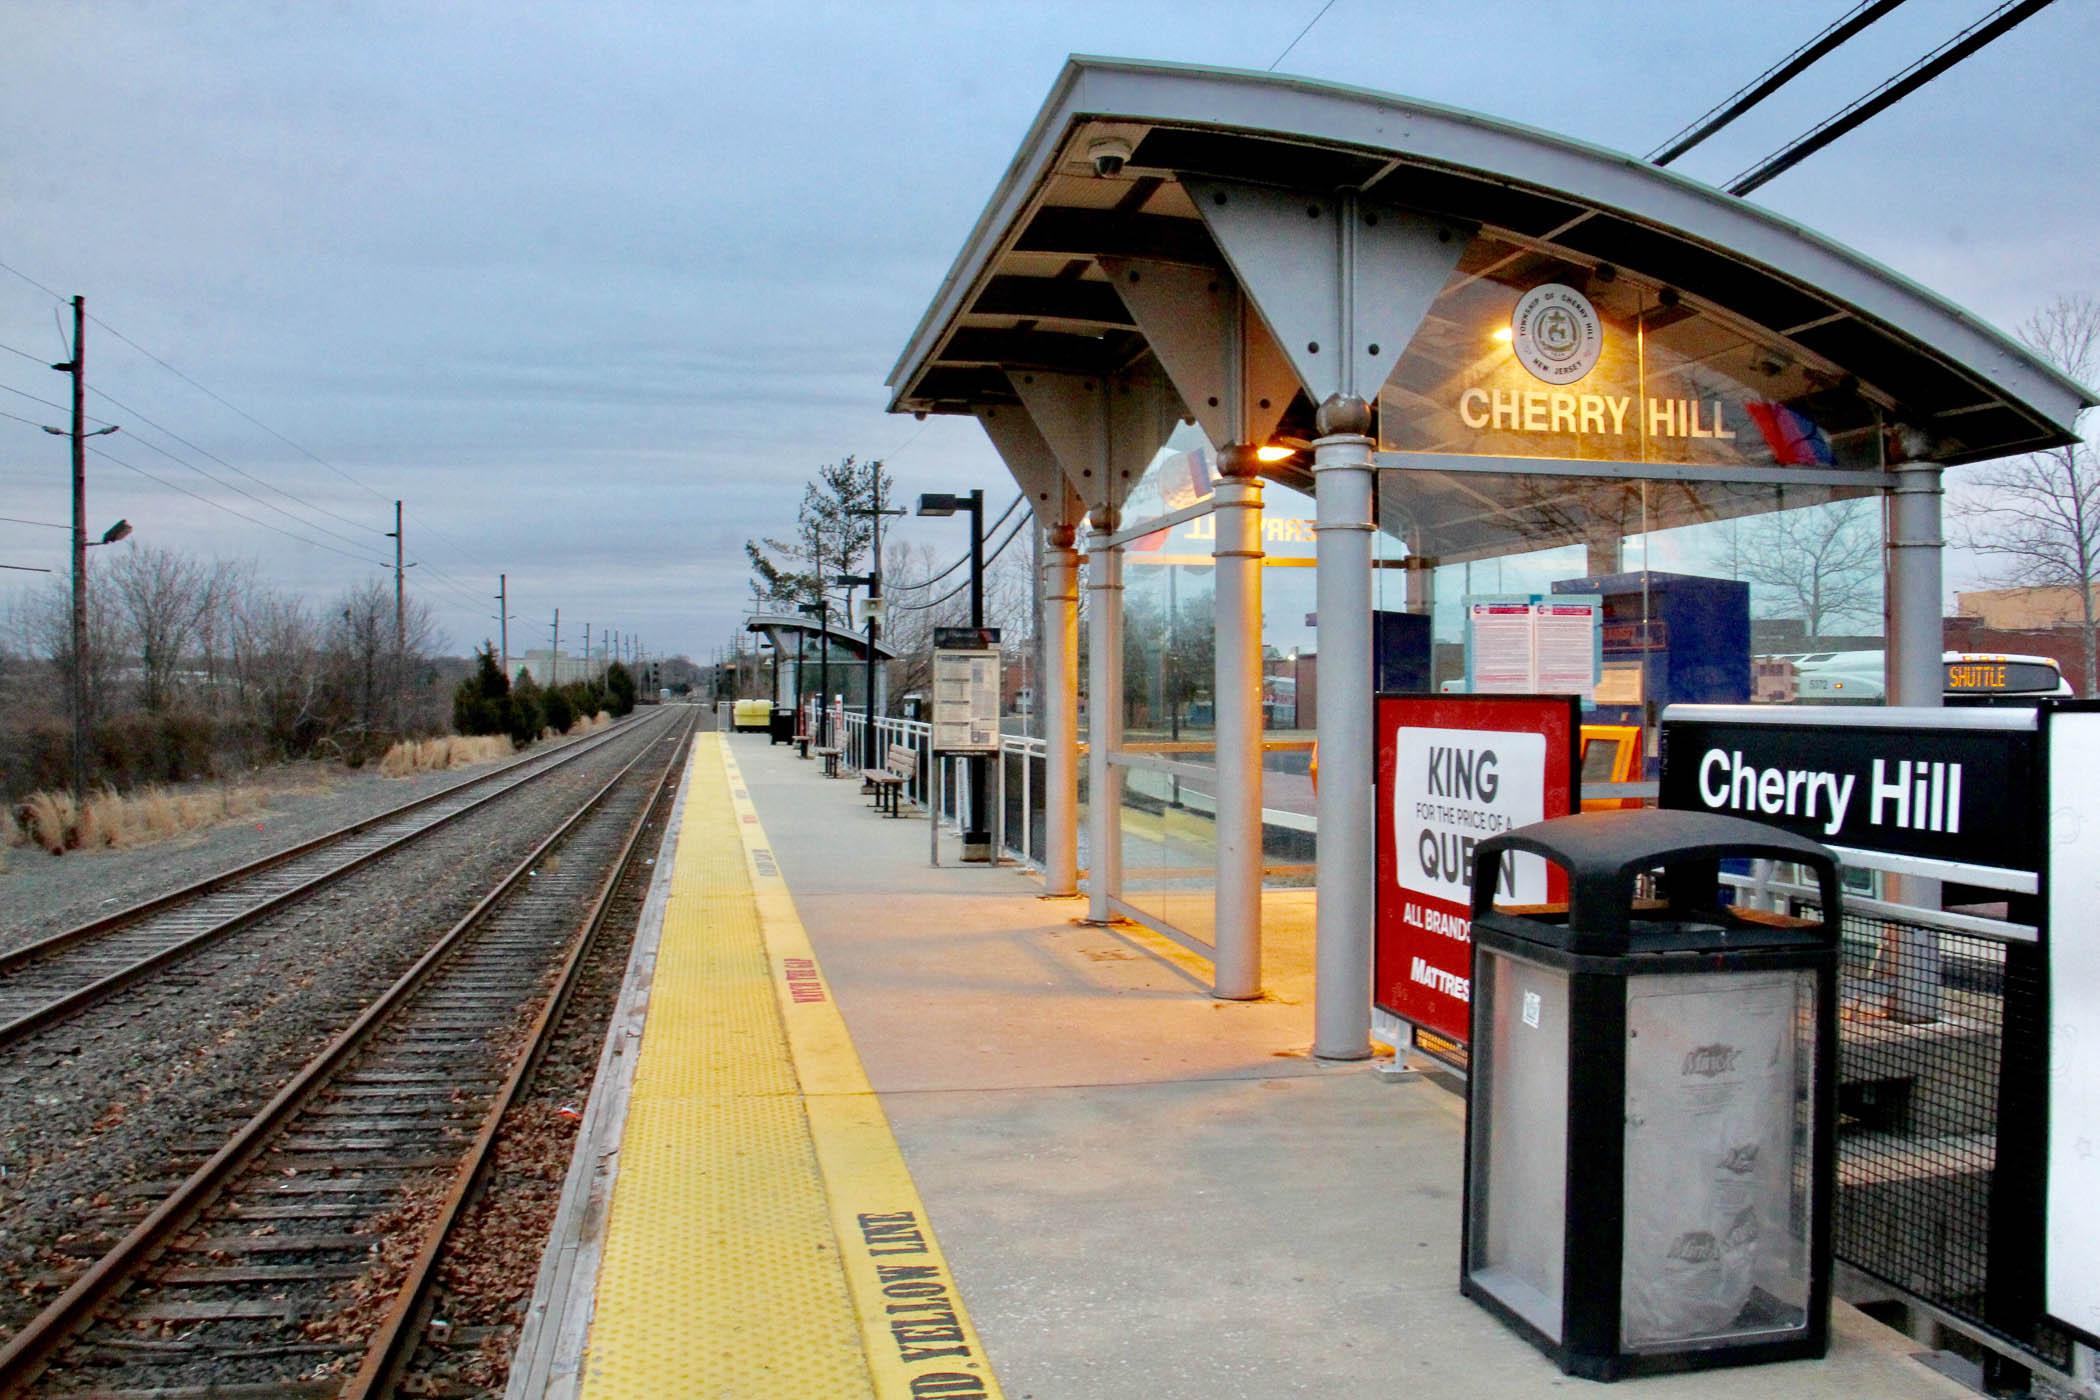 Nj Transit S Atlantic City Line Won T Be Back Until May 24